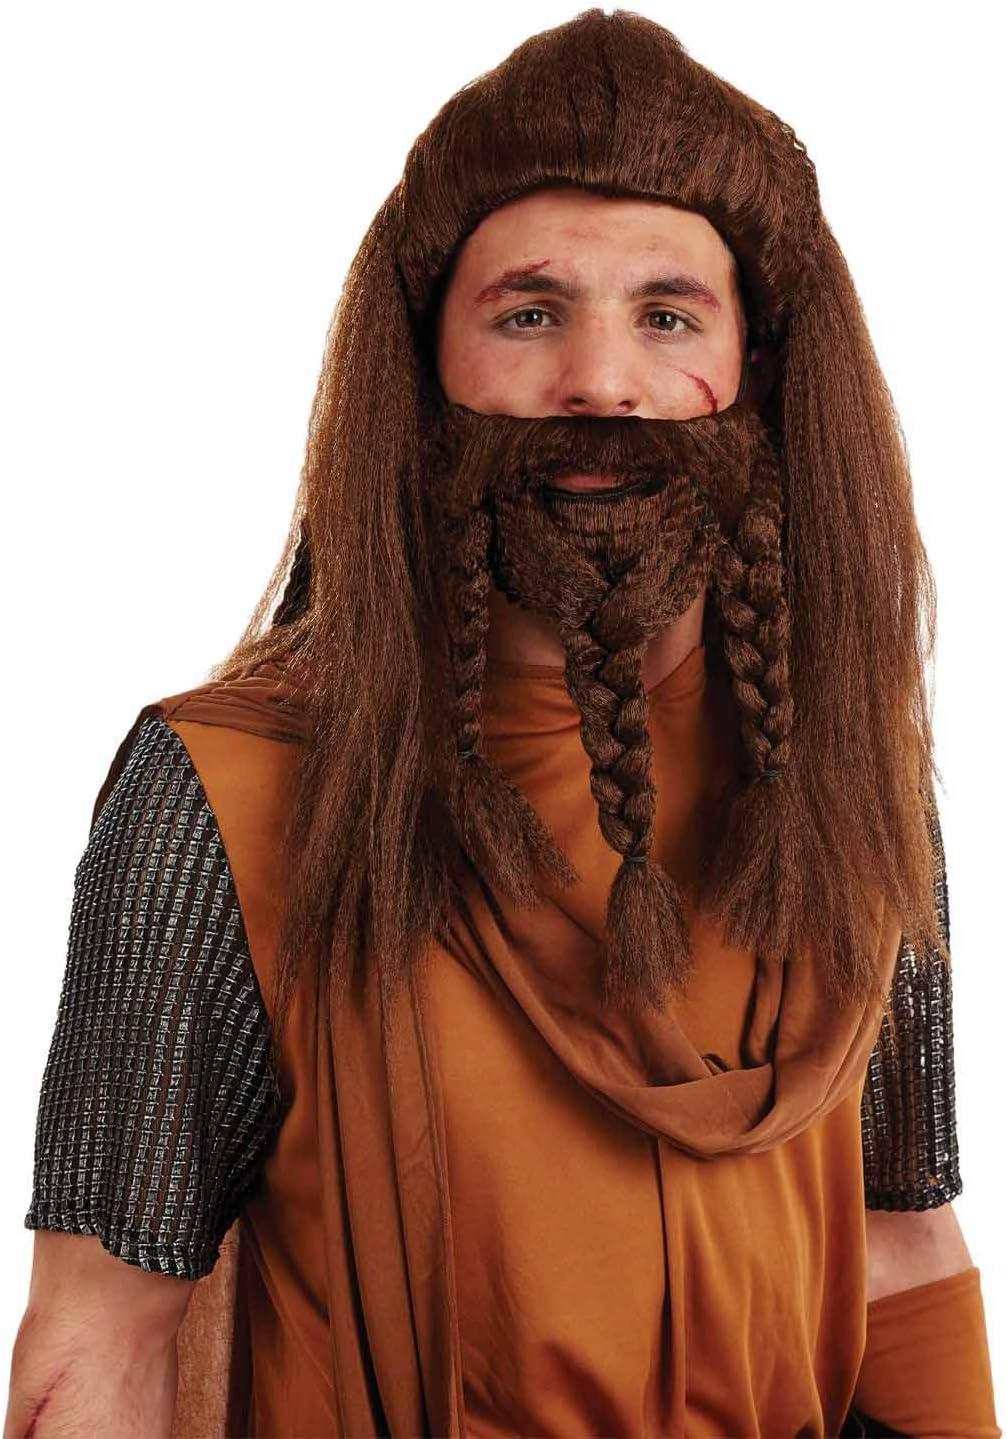 Fun Shack Mens Viking Wig Beard Adults Historical Braided Brown Hair Costume Accessory Amazon Co Uk Toys Games